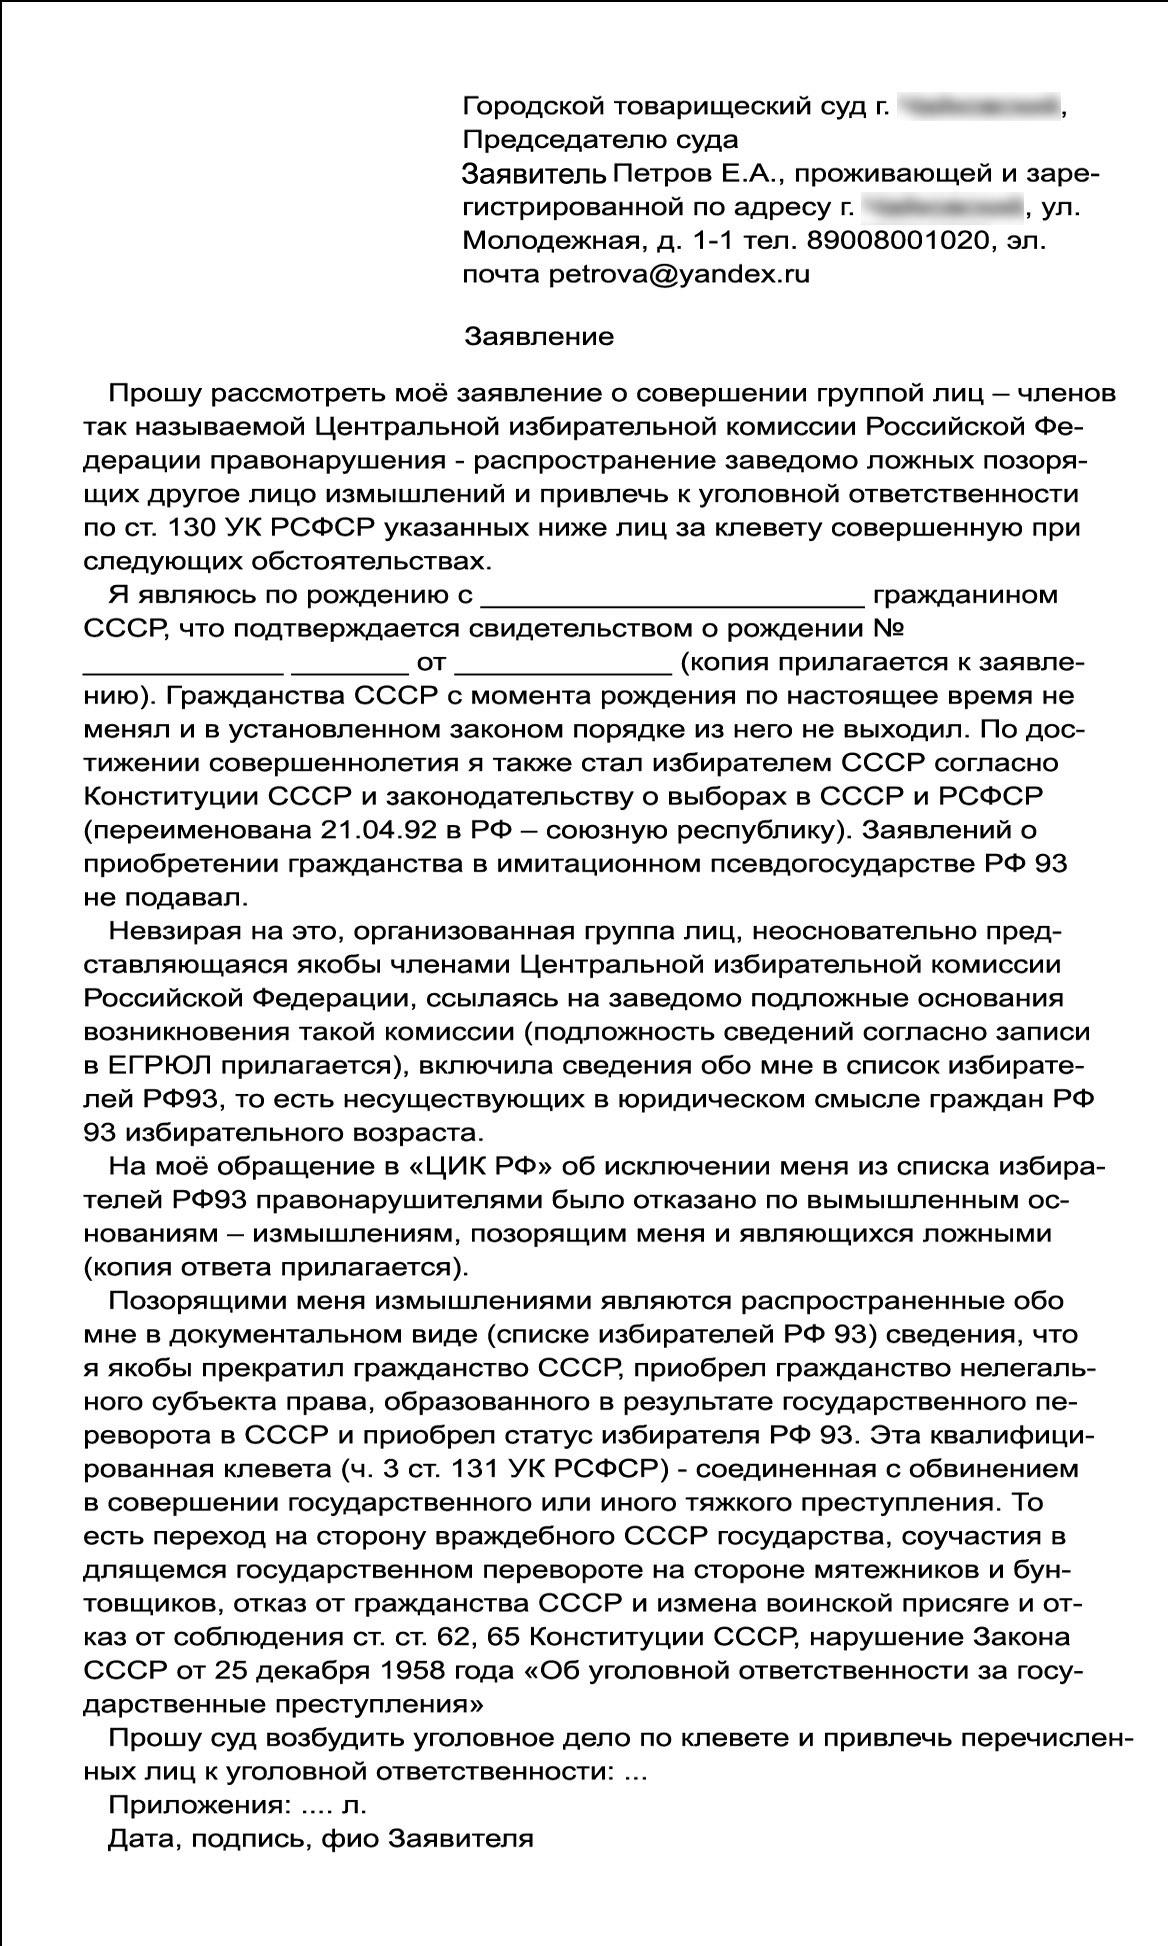 http://grazhdane-sssr.ru/wp-content/uploads/2016/01/kleveta.jpg